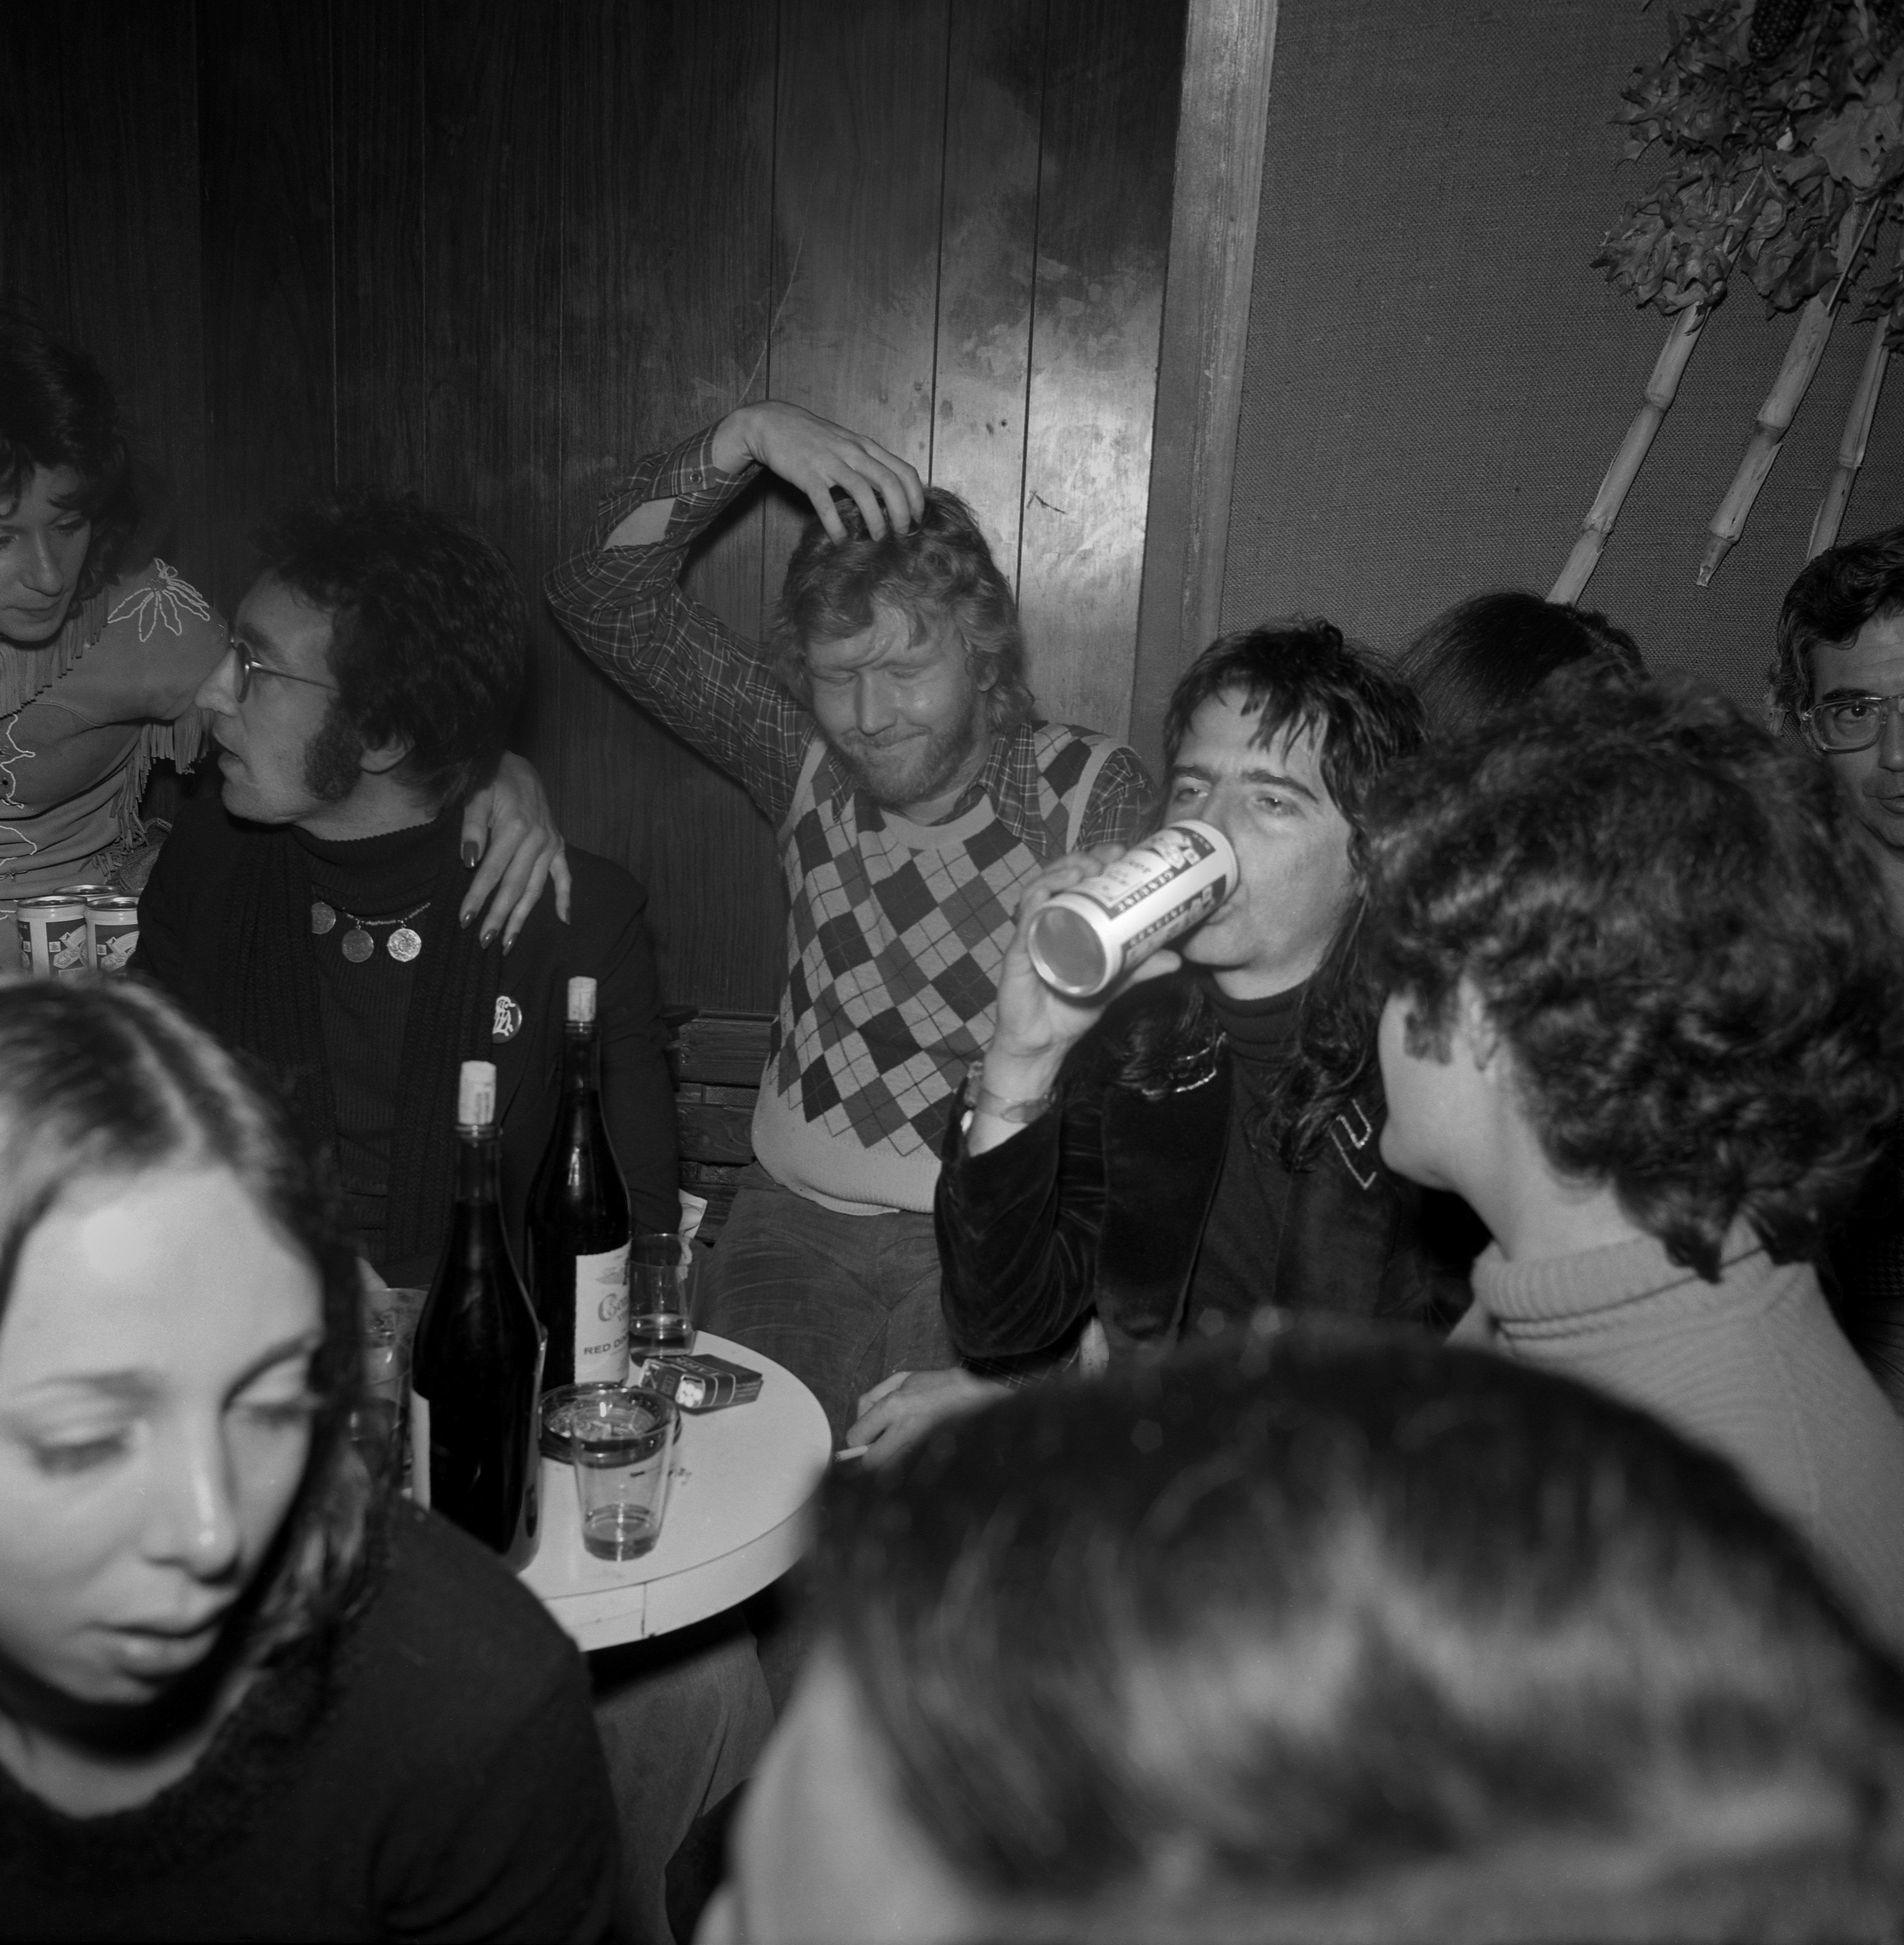 John Lennon, Harry Nilsson, Alice Cooper, and Micky Dolenz